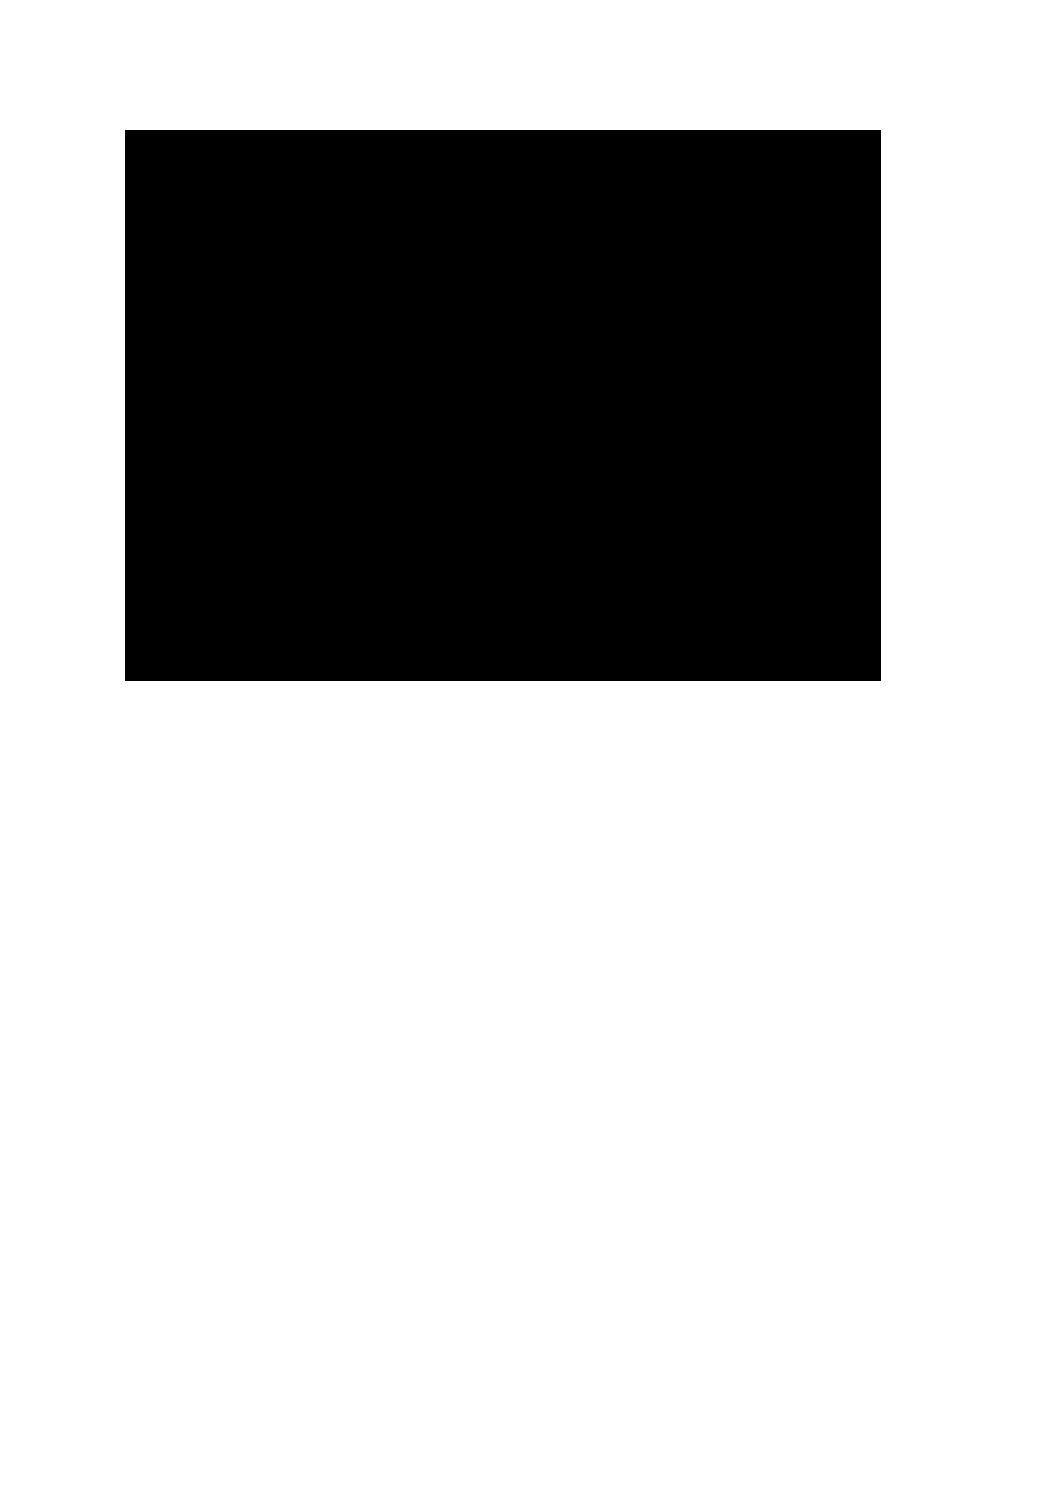 Figuur Stroomschema Selectieproces